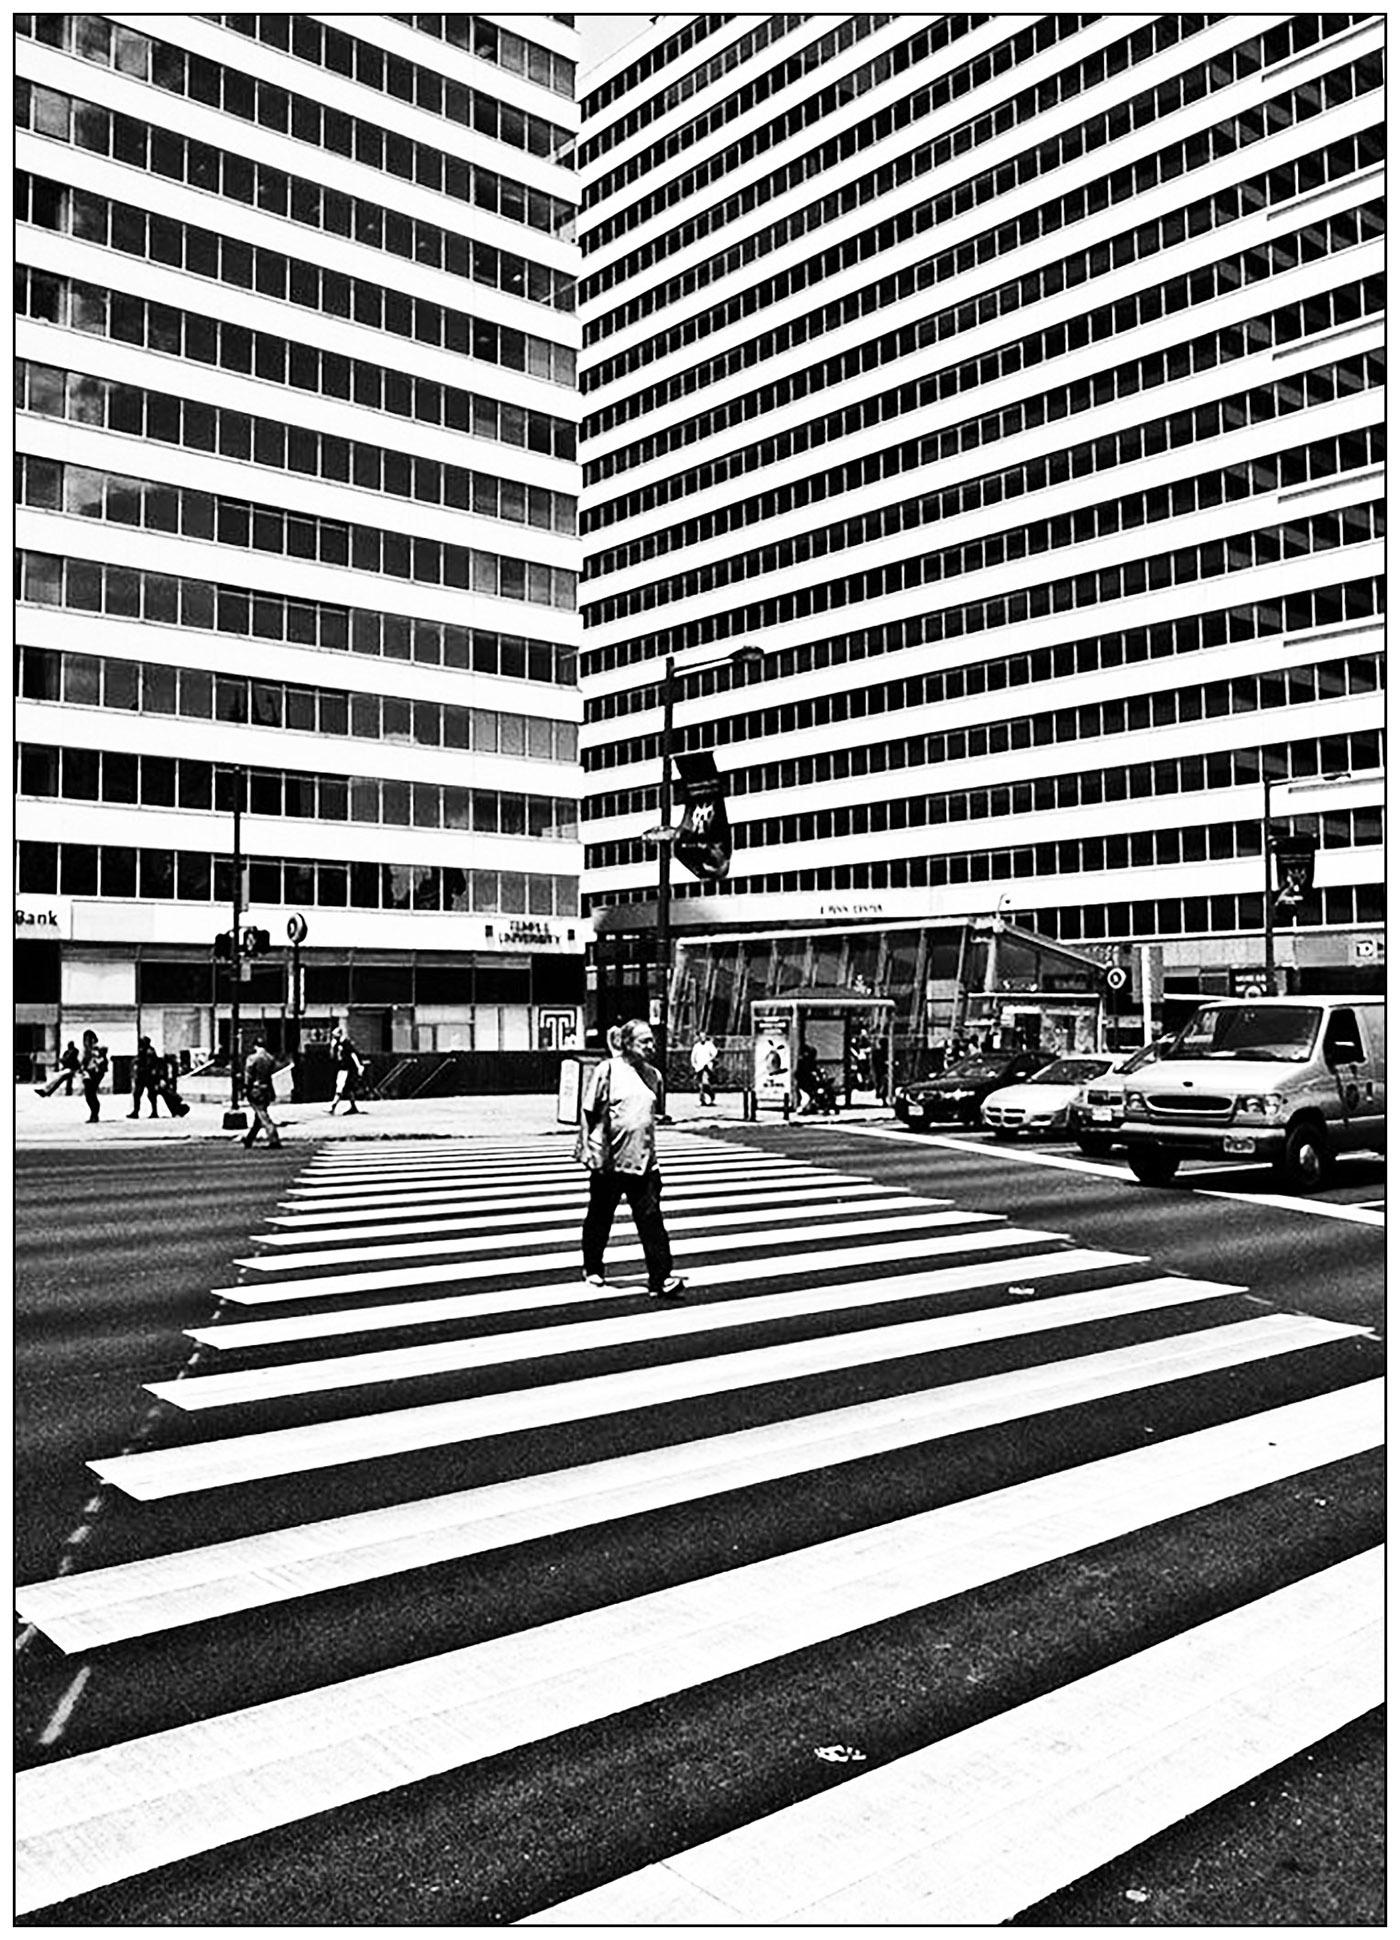 New york 31274